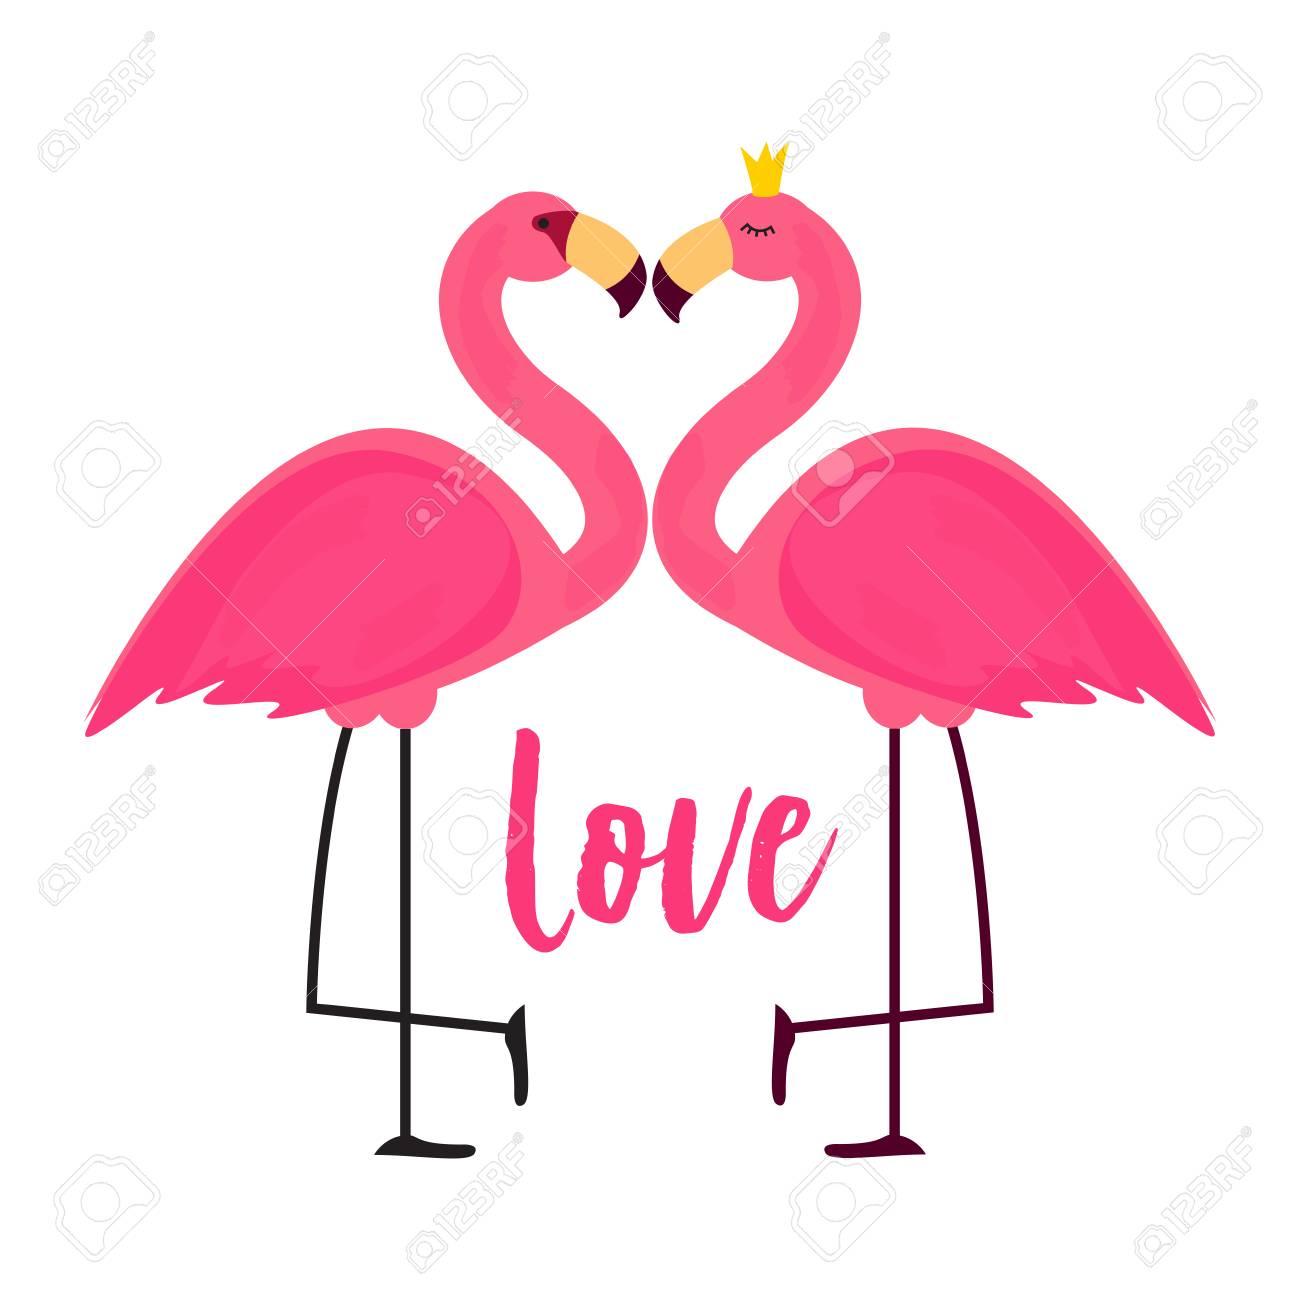 Flamingo Cartoon-Royalty-free clipart - Flamingo png herunterladen -  822*1200 - Kostenlos transparent Rosa png Herunterladen.